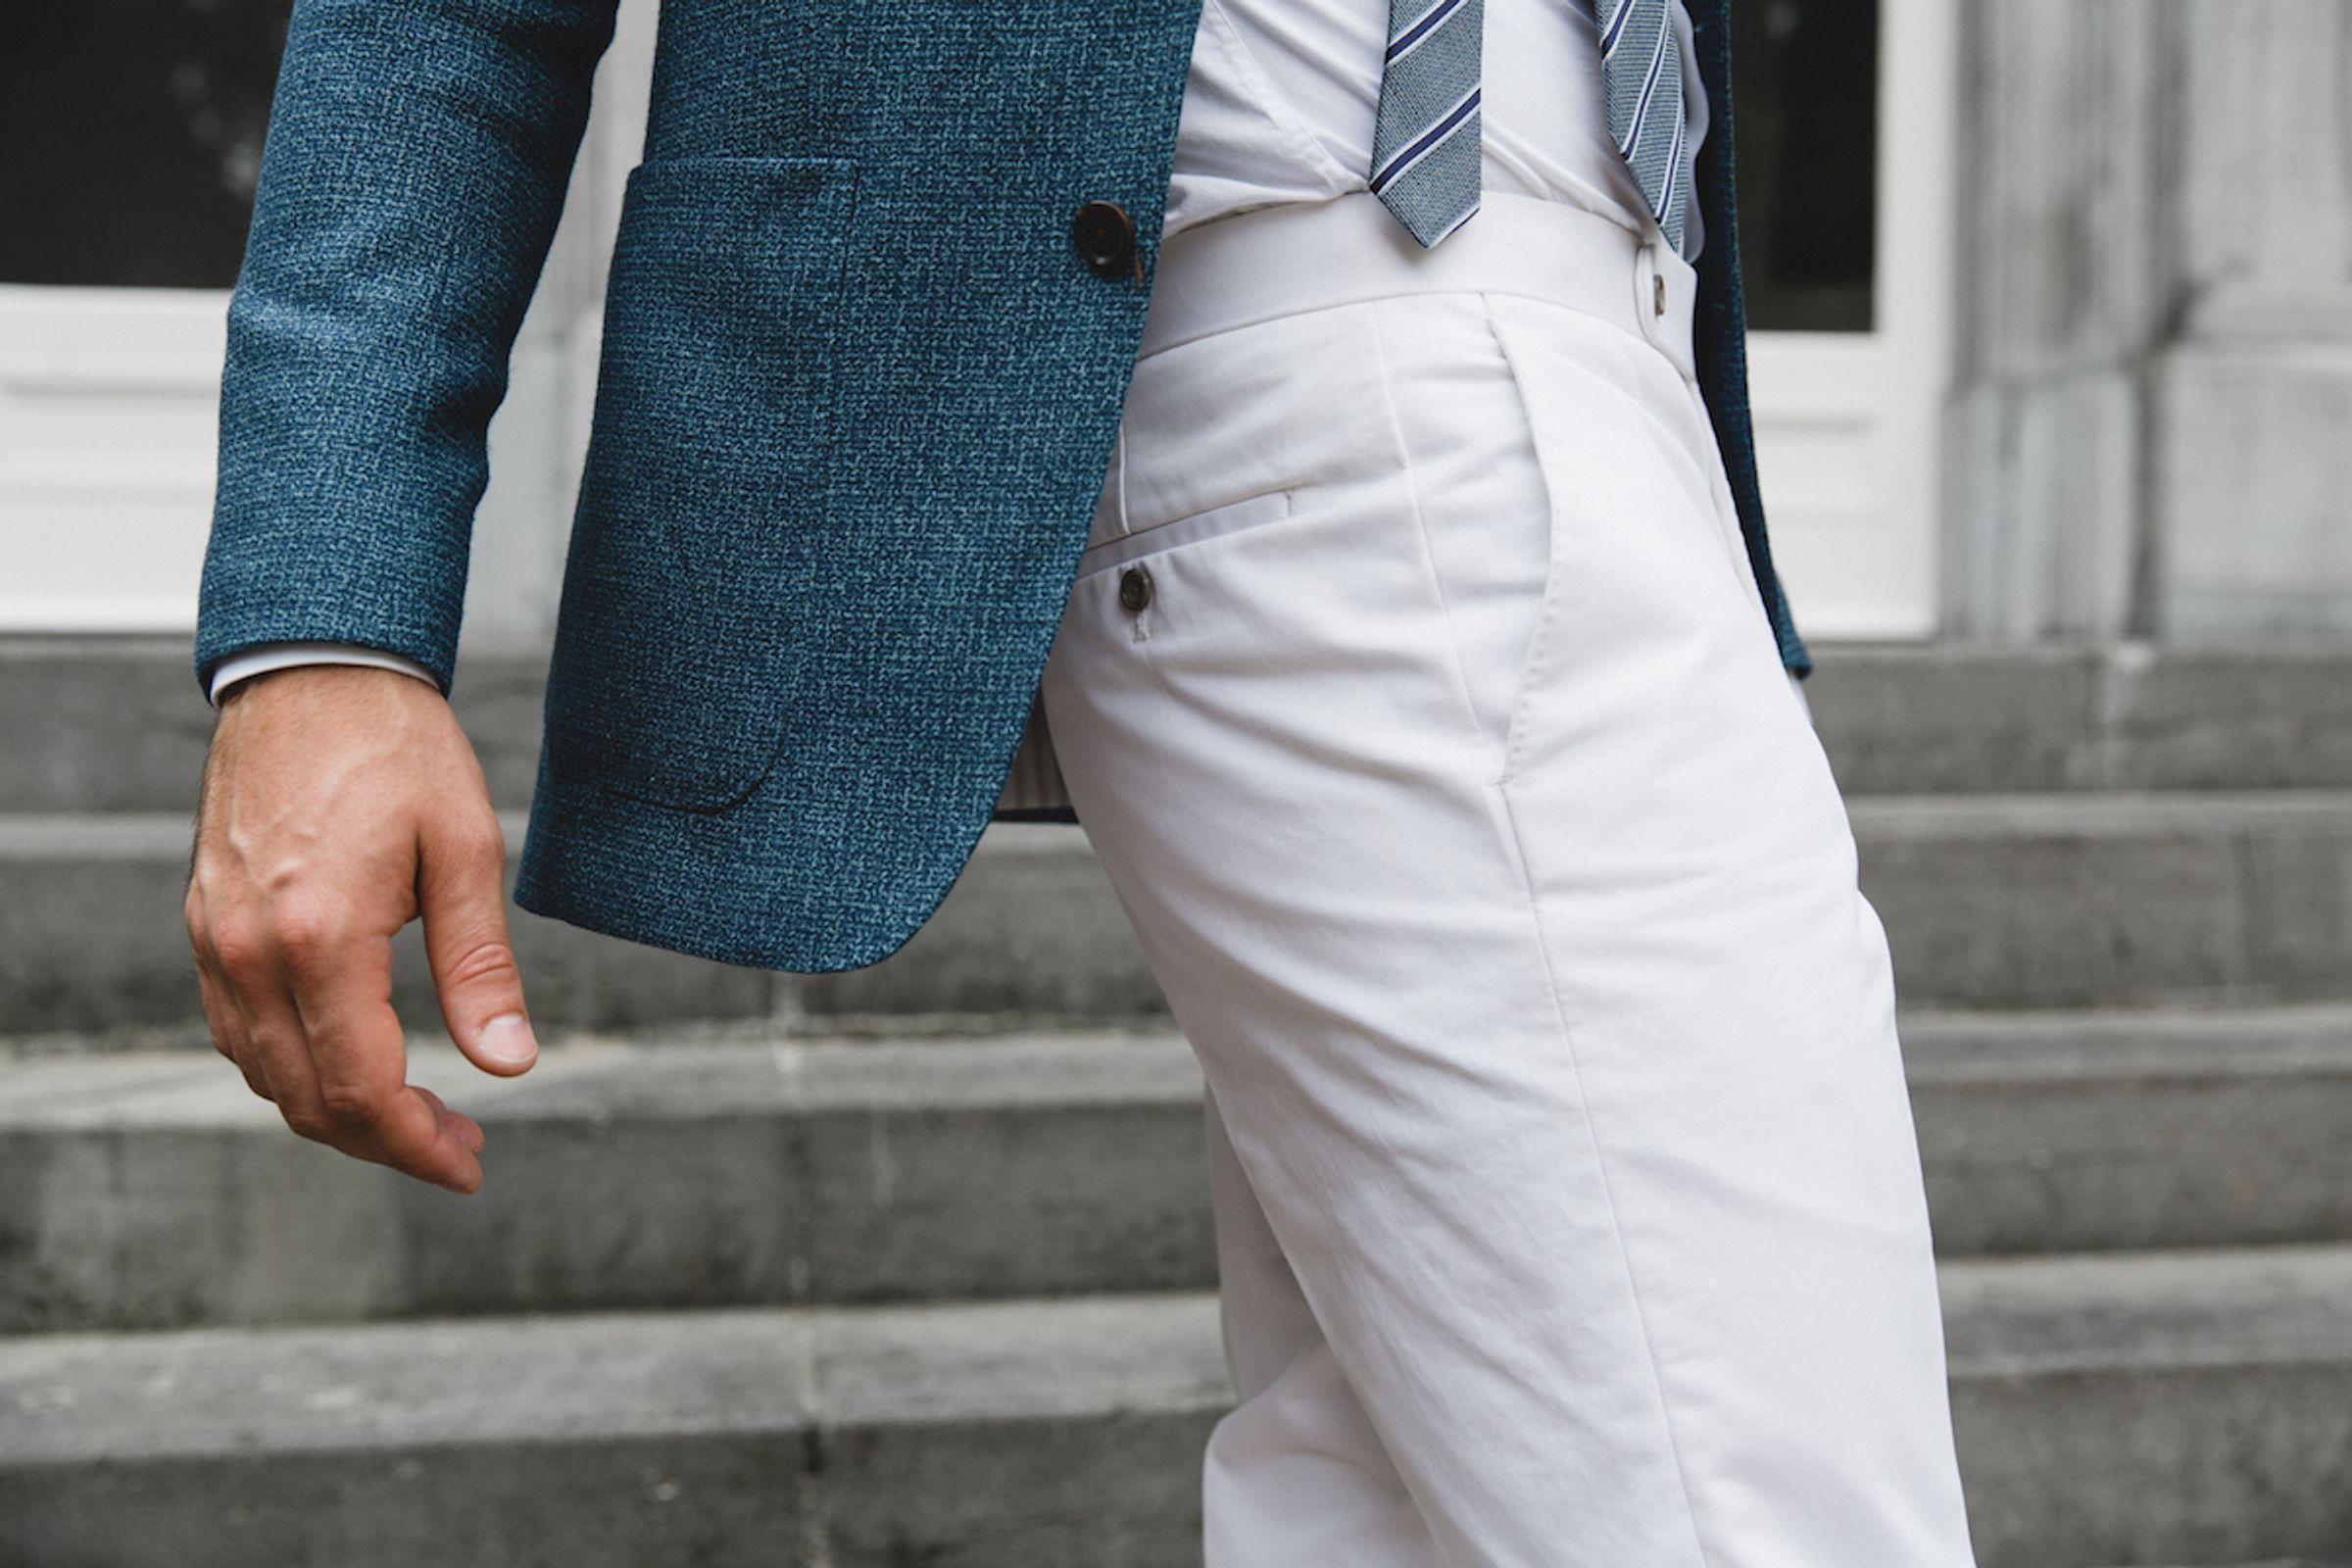 Phil trouwpak Michael & Giso bruidegom in lichte pantalon en donkere jas